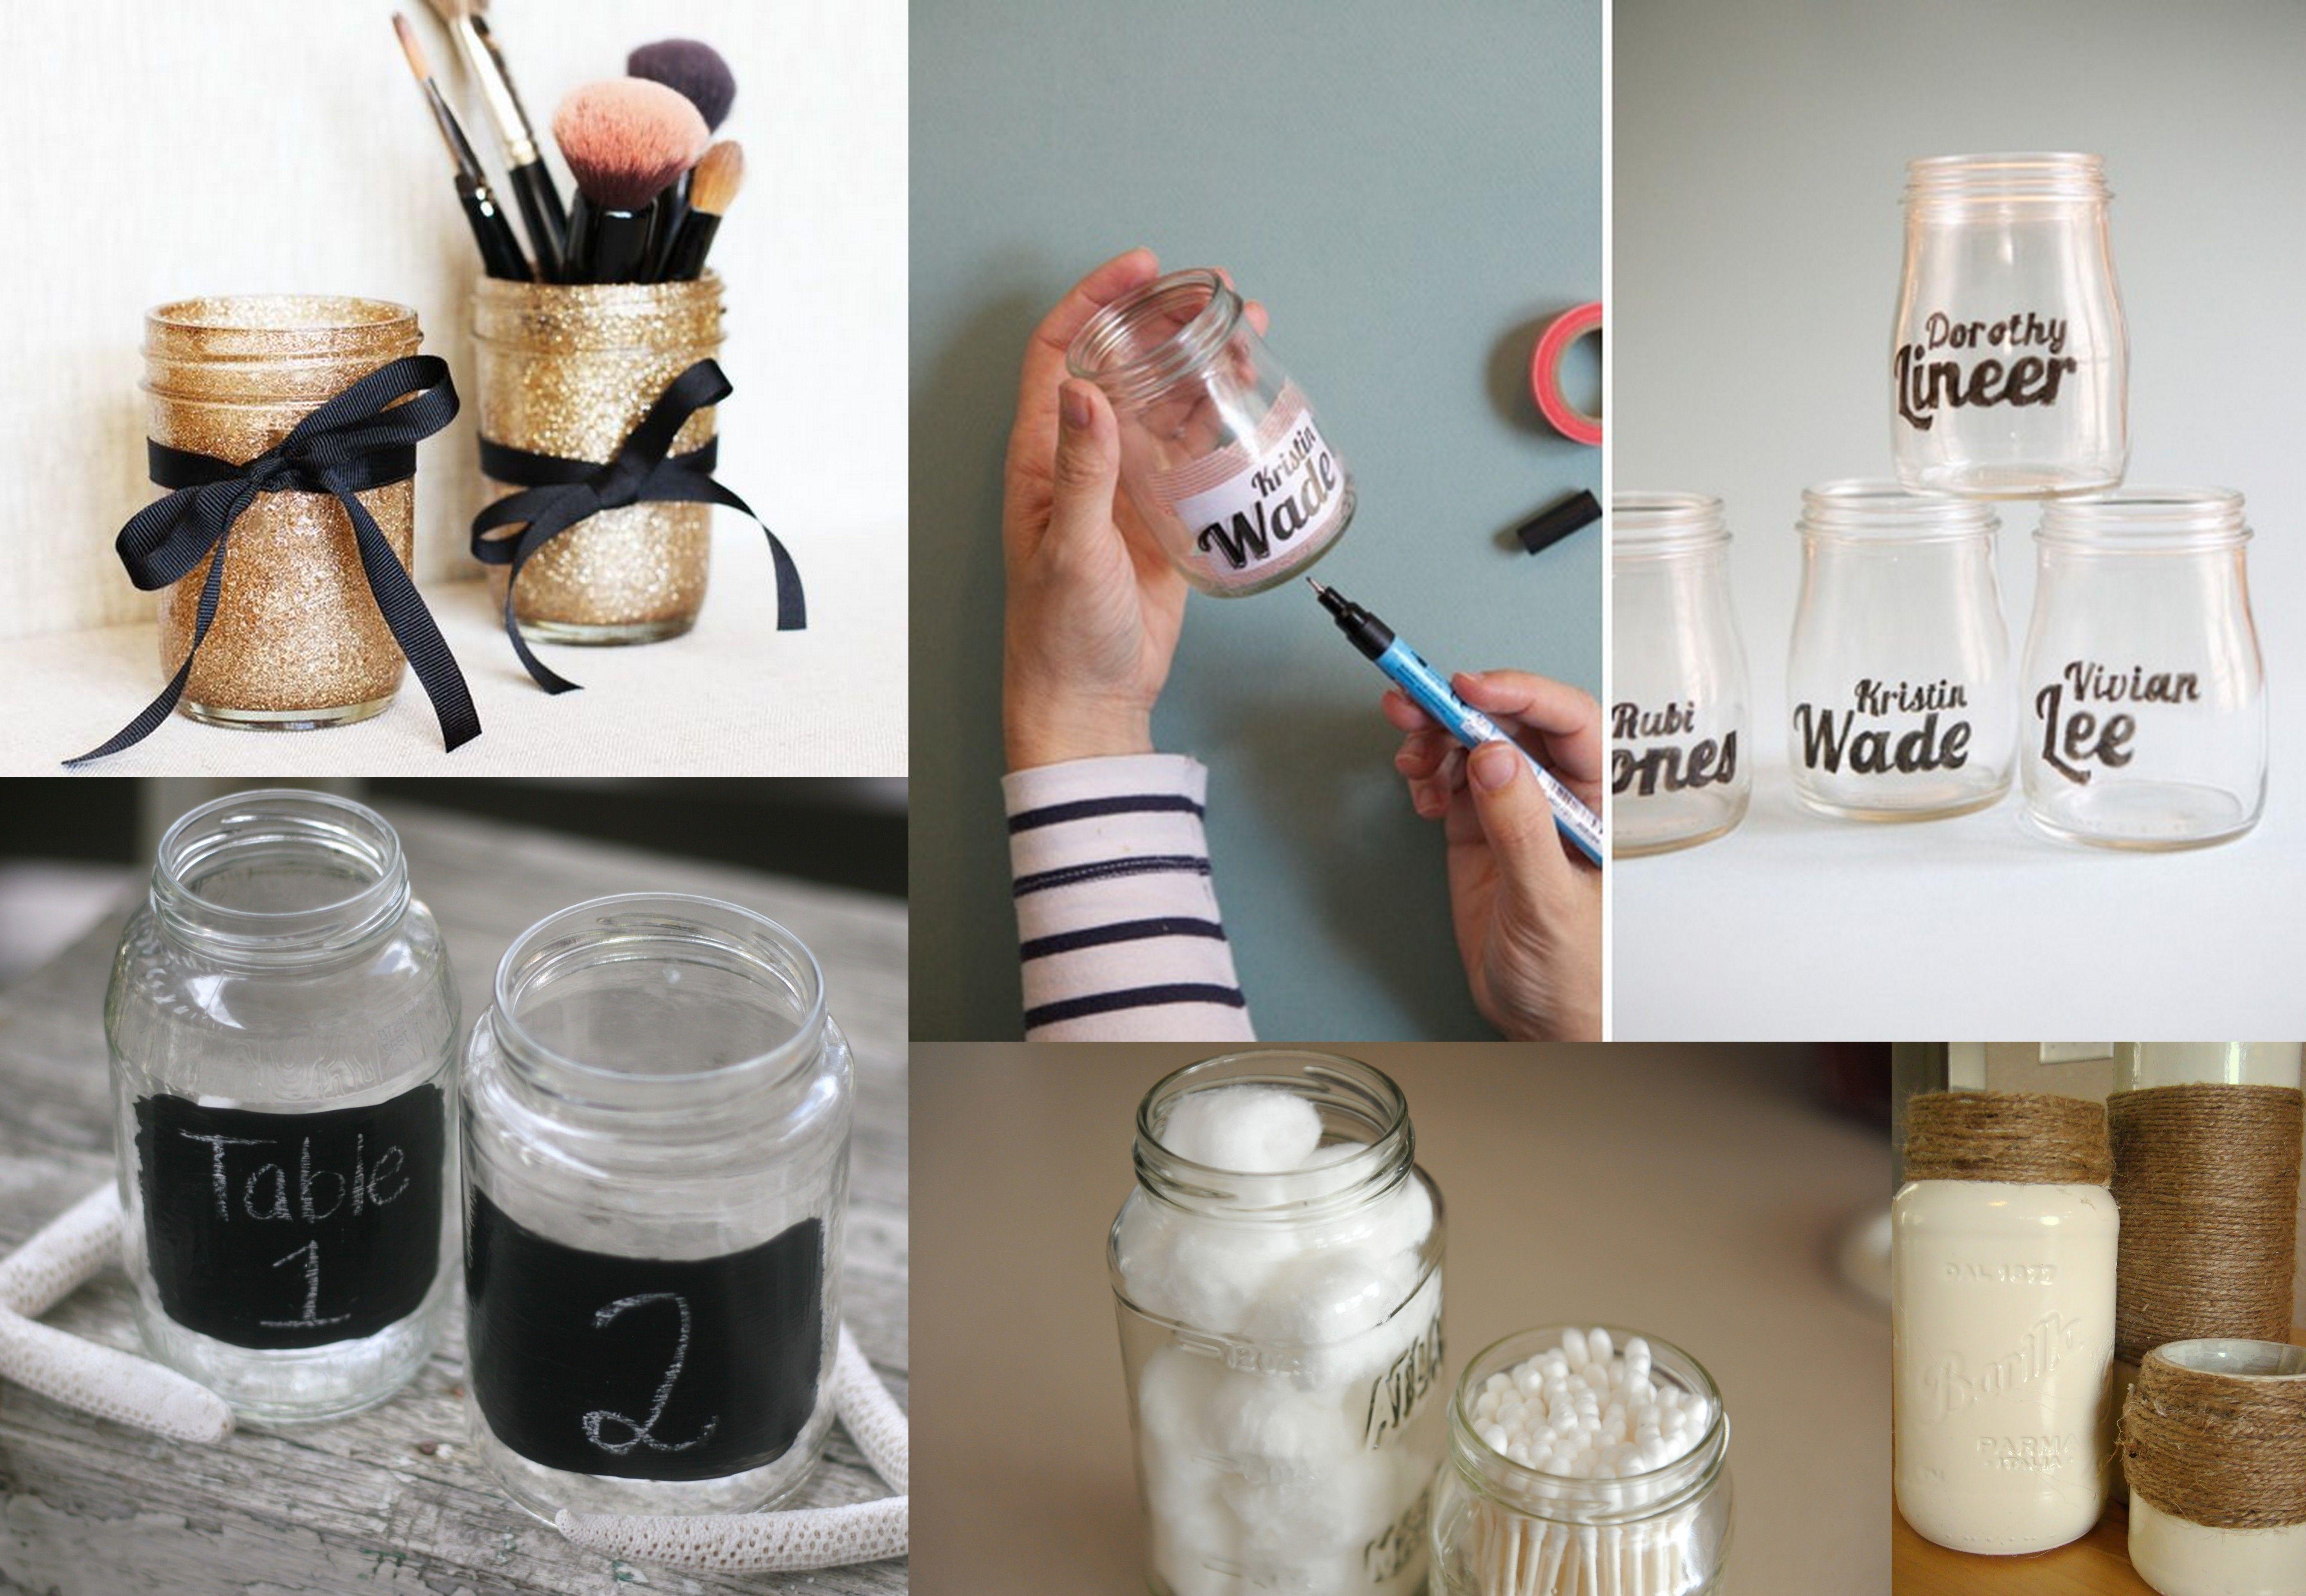 diy+decor+decoración+reciclar+makeup+makeupdecor | EVENTOS ...